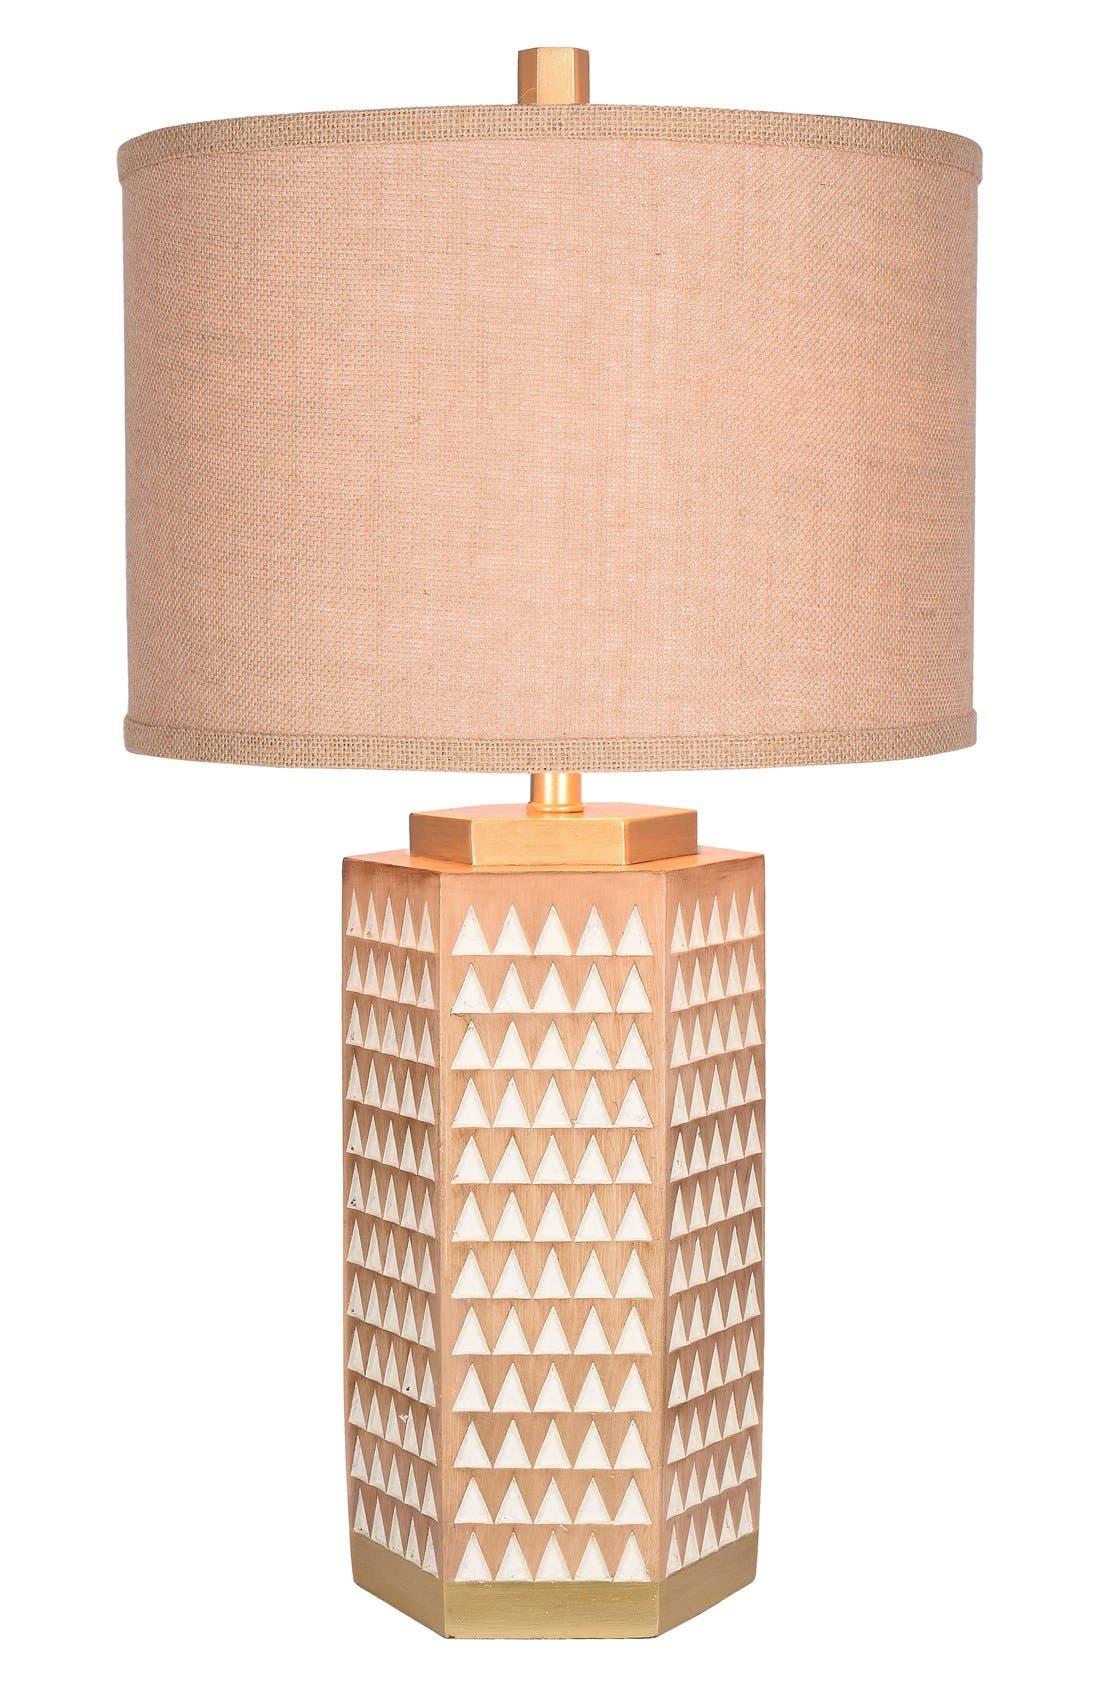 JAlexander Kinsley Faux Wood Table Lamp